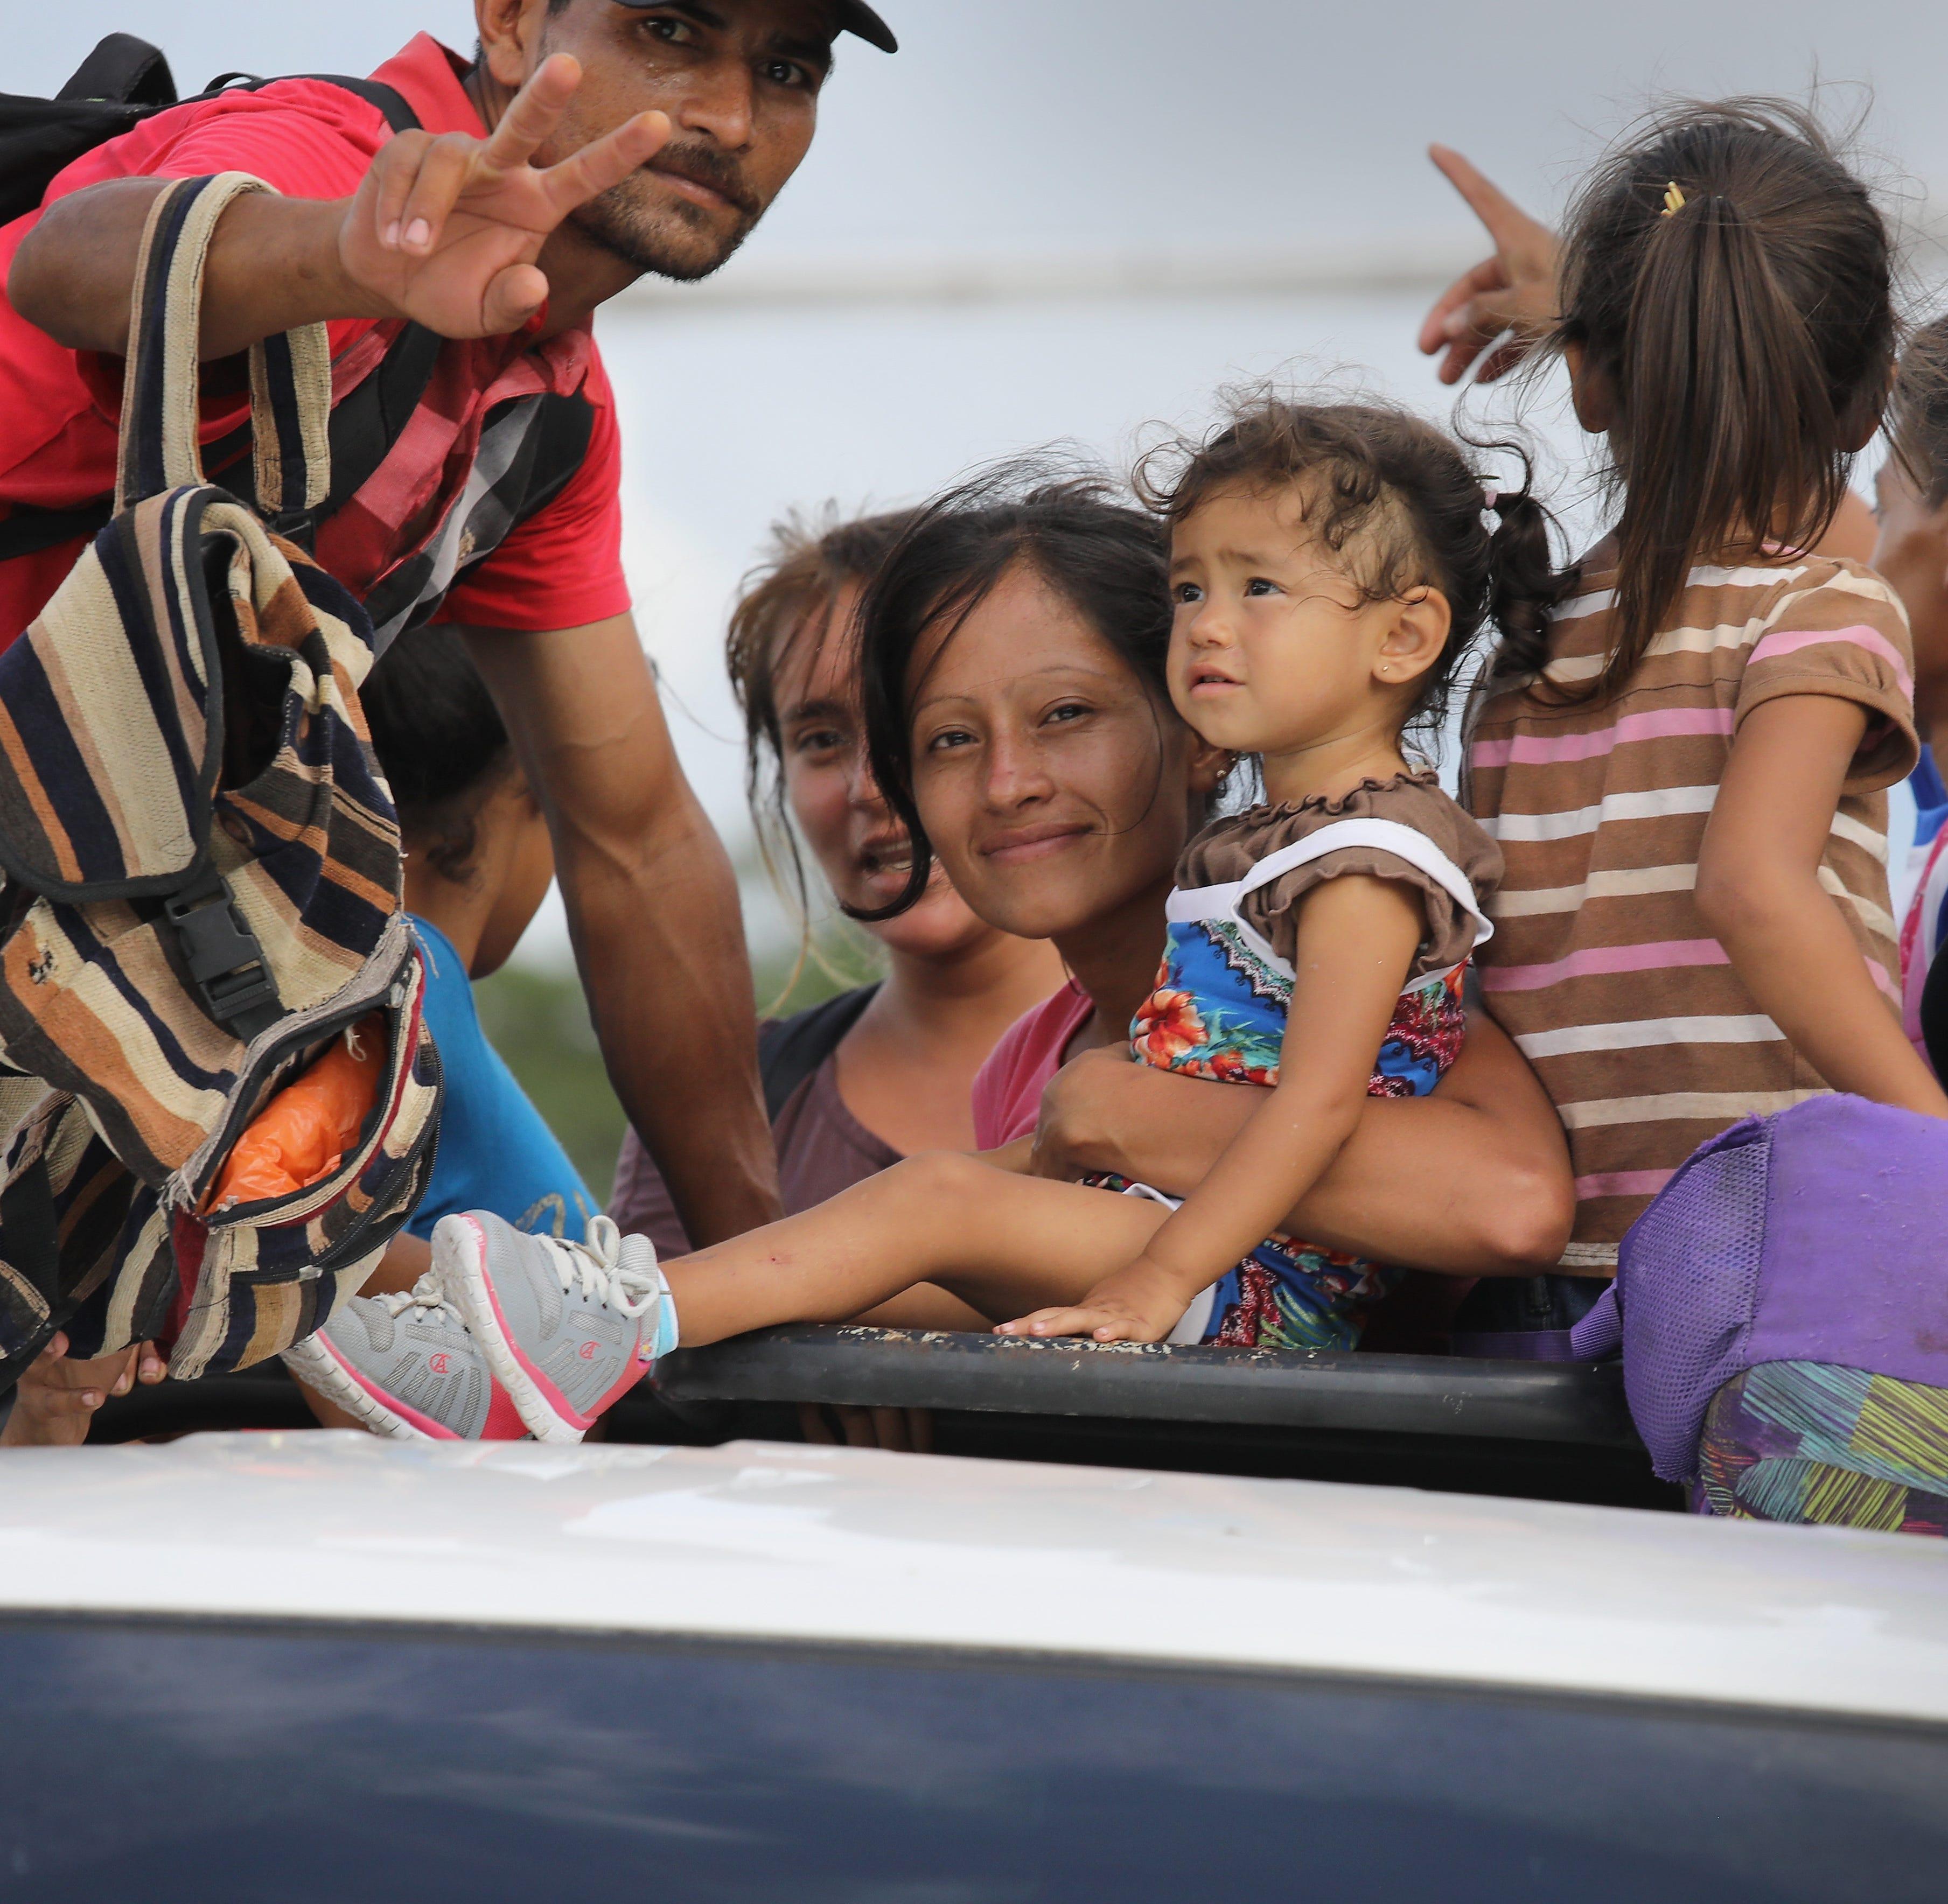 Nashville activists track Honduran caravan, response from Mexico